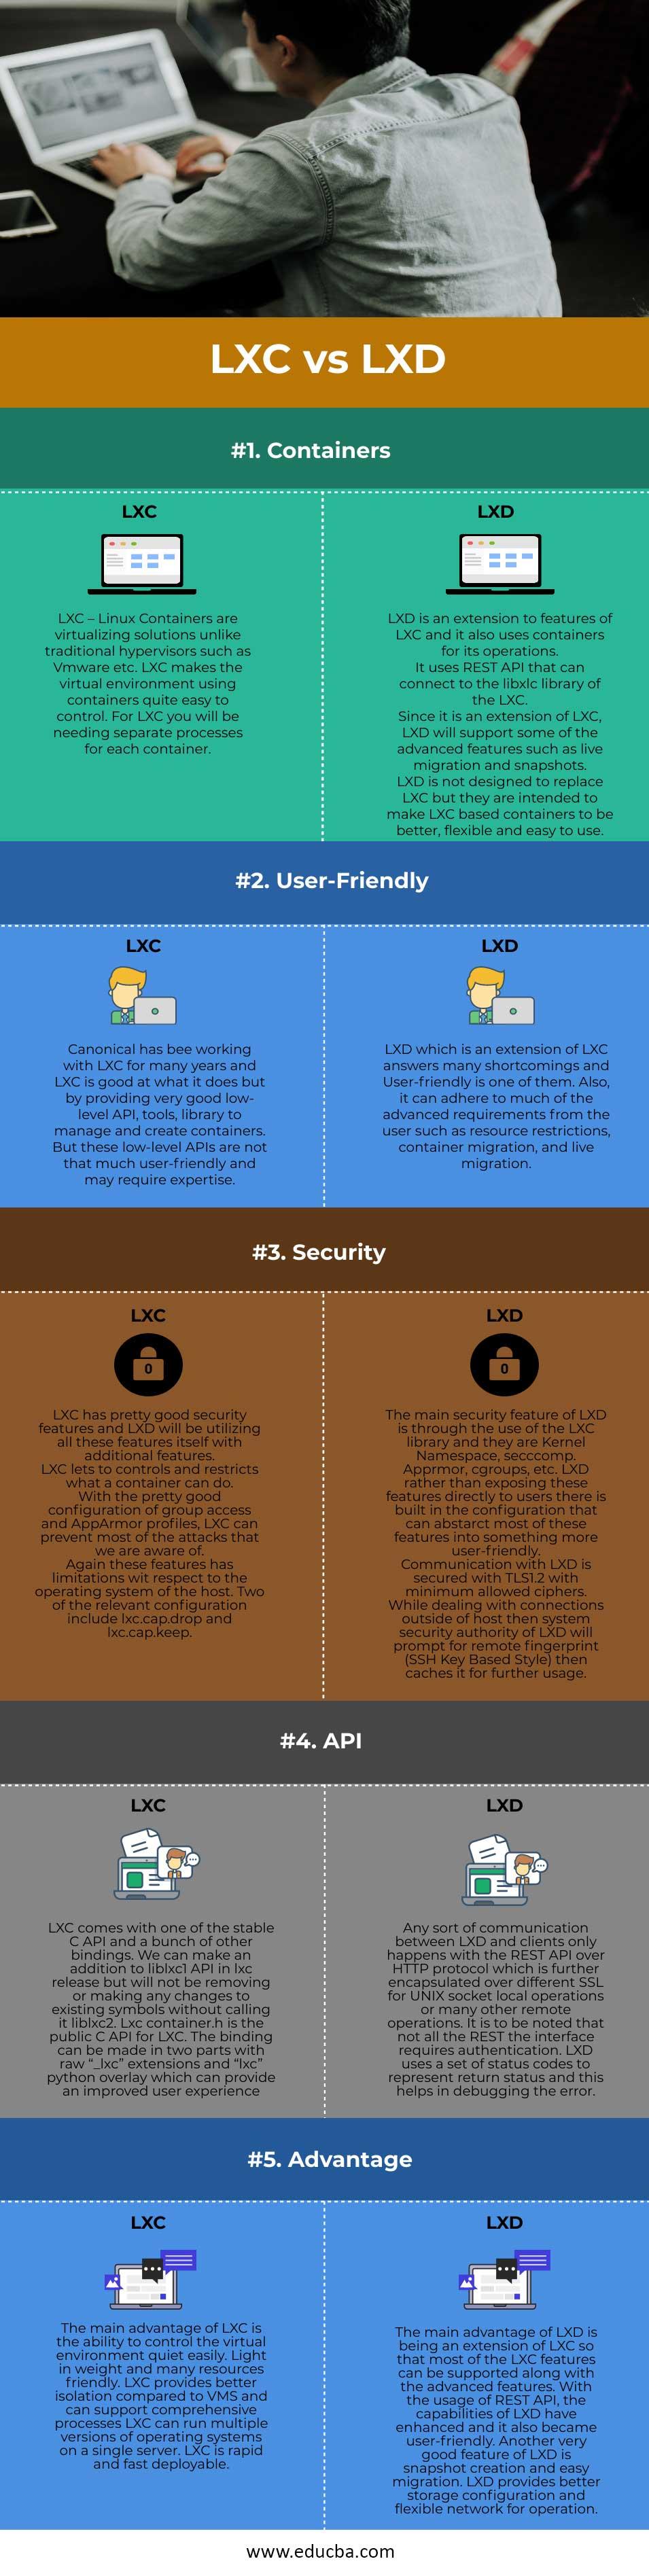 LXC-vs-LXD-info